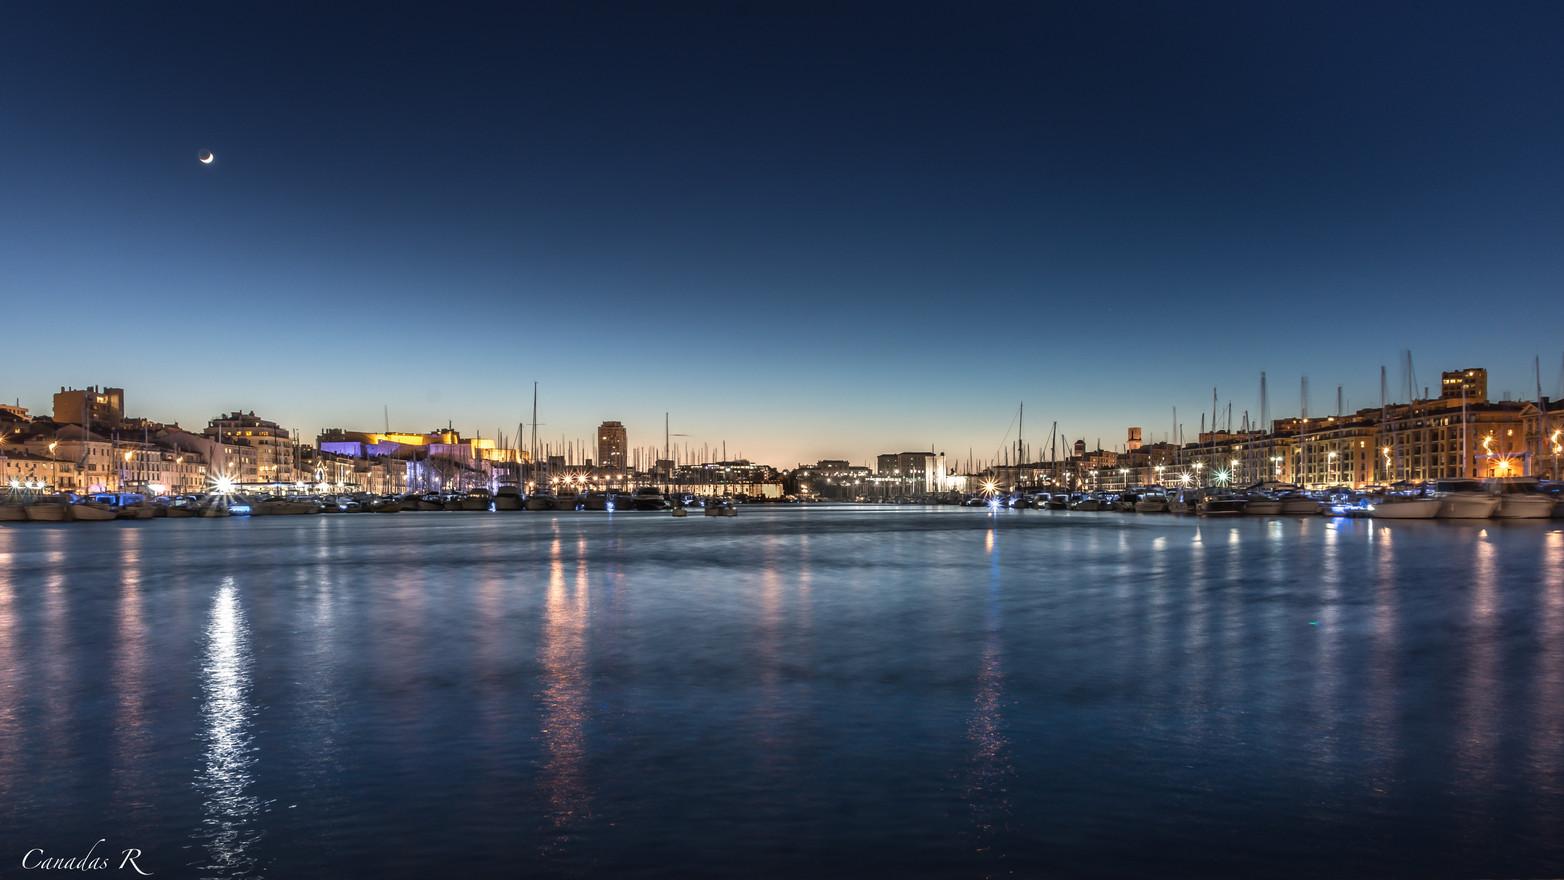 Vieux port by night.jpg